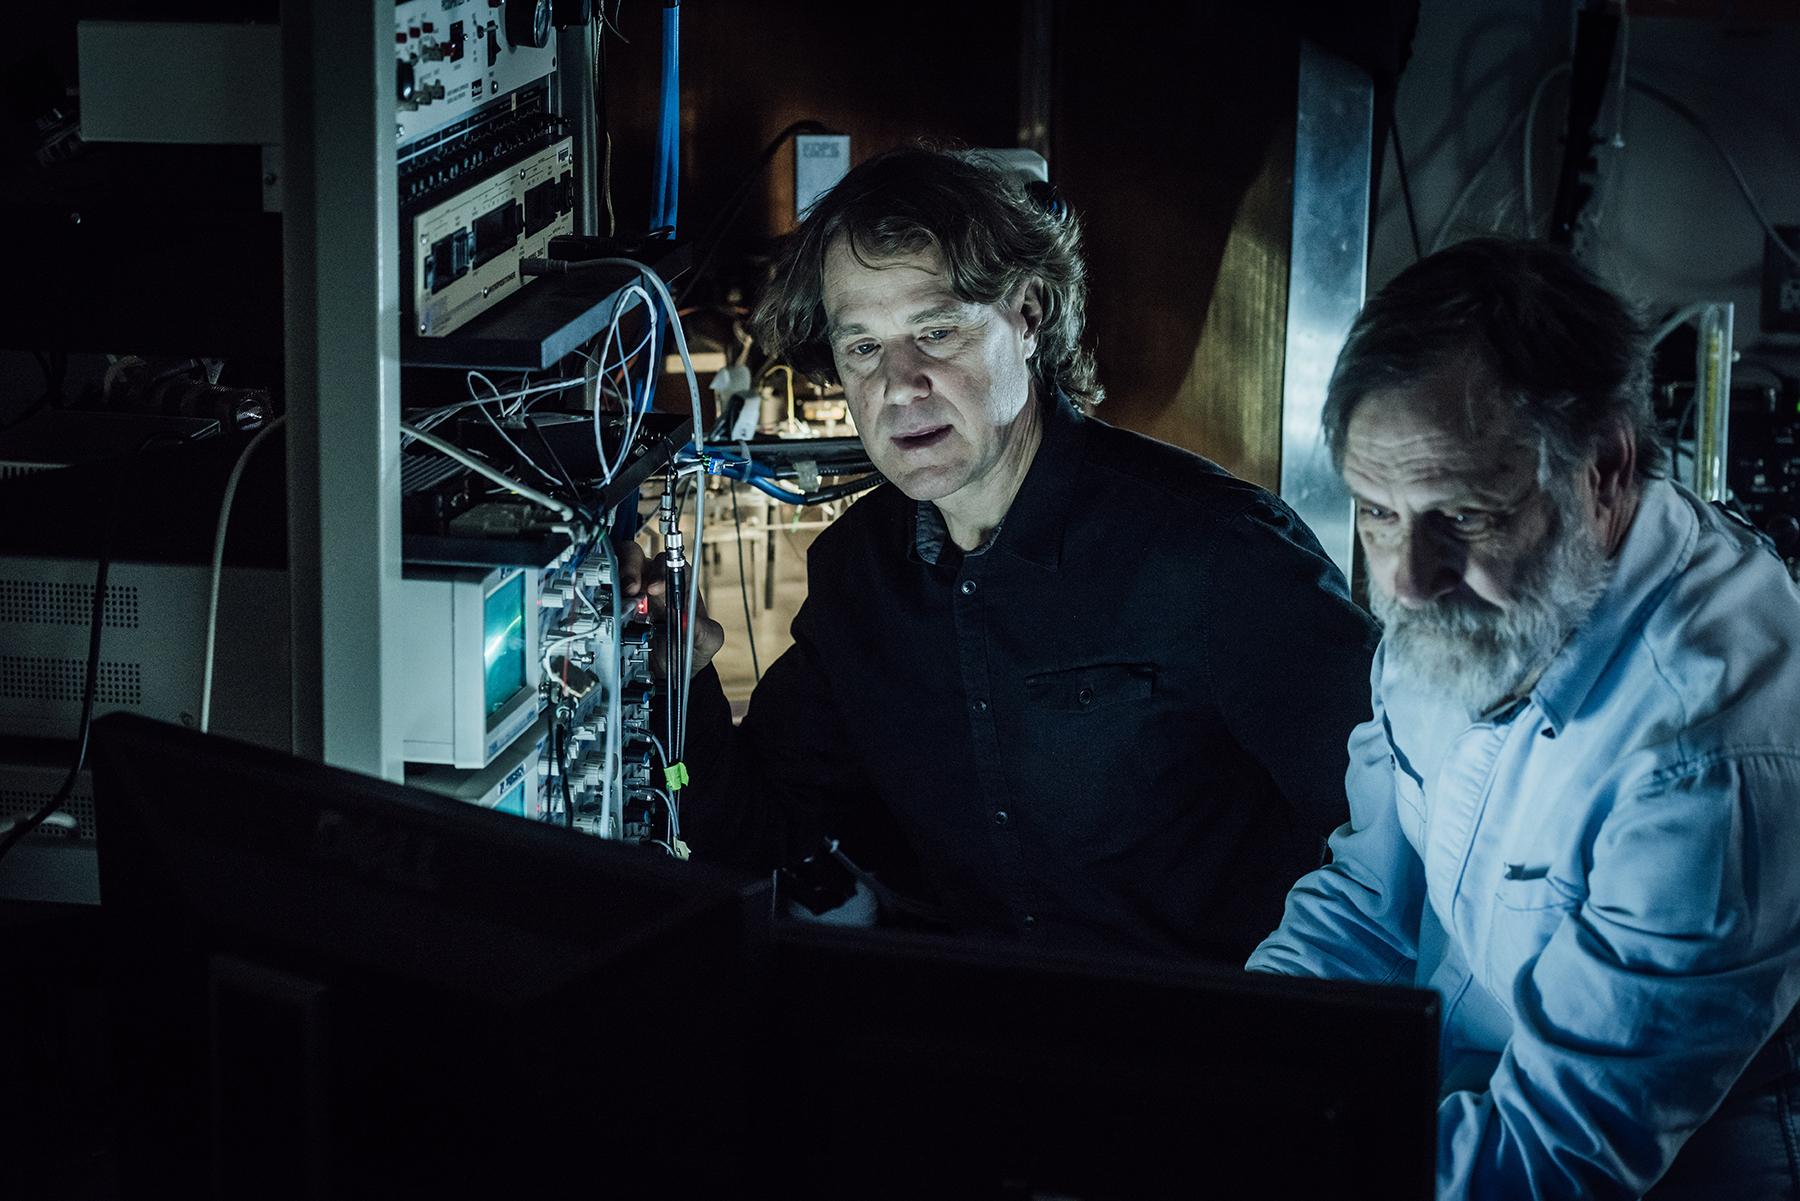 Leonard Maler and André Longtin / Leonard Maler et André Longtin